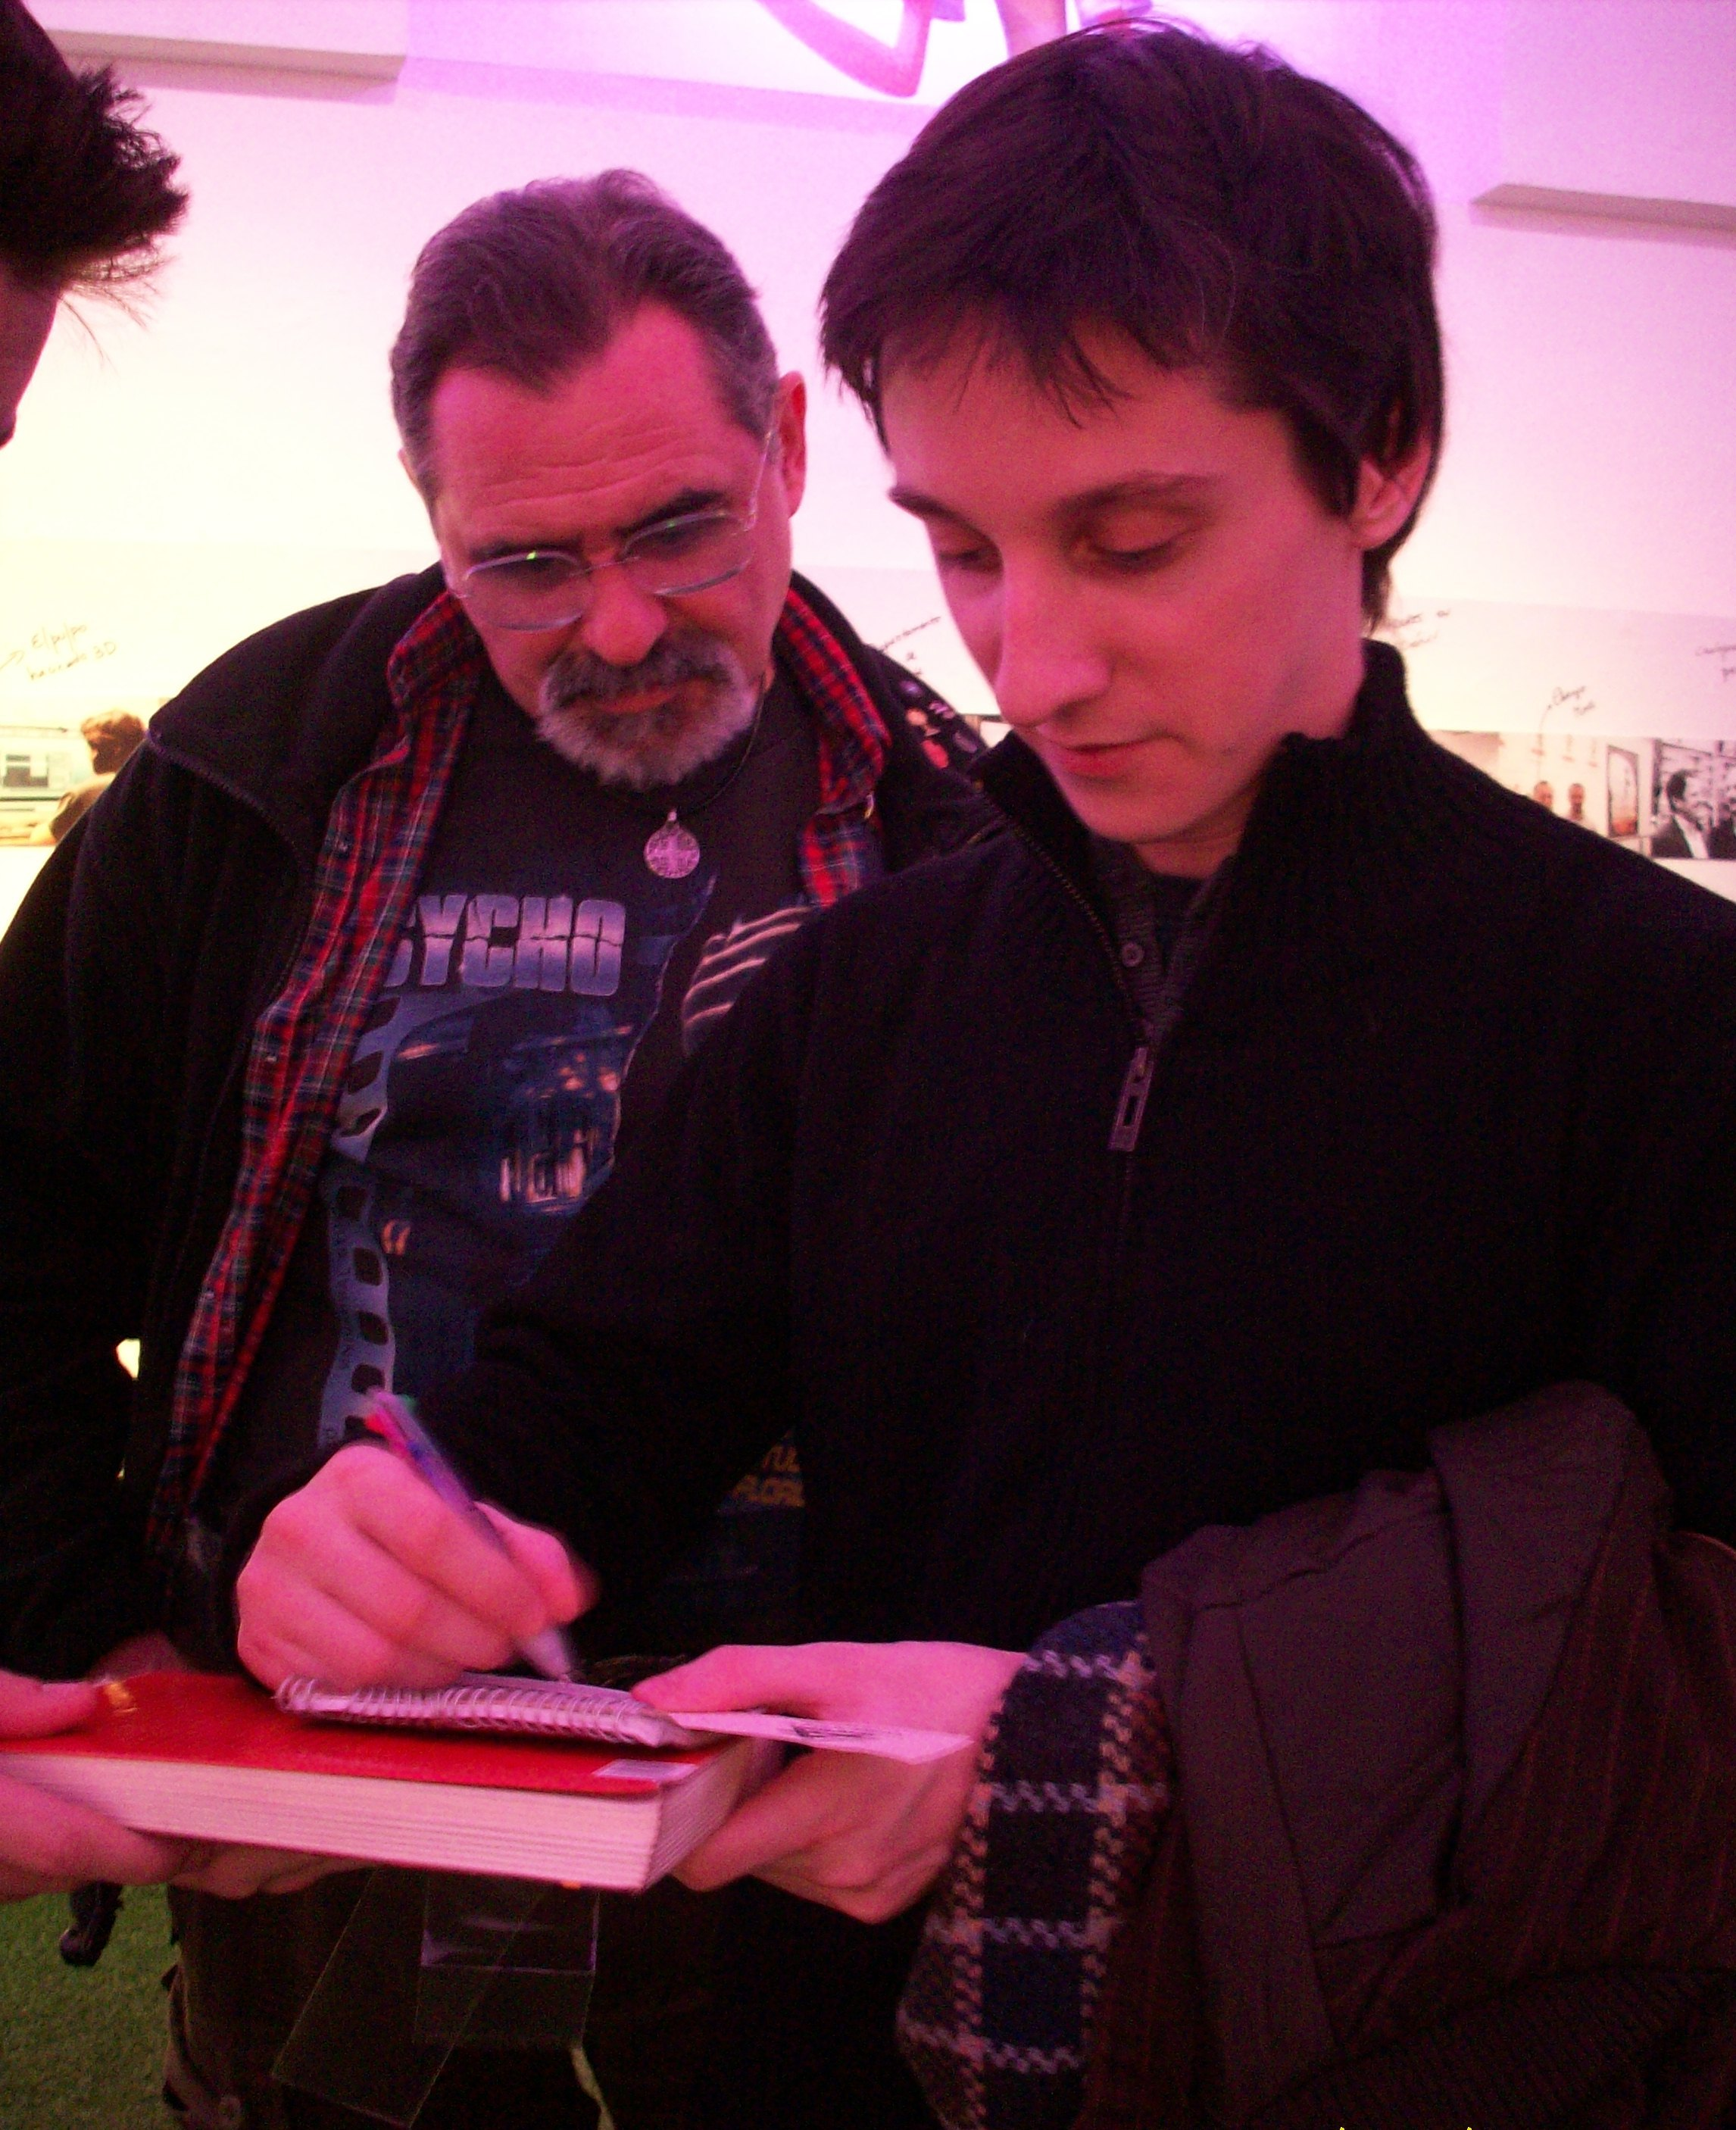 Tan joven… y ya firmando autógrafos (¡ESA, Nico!).